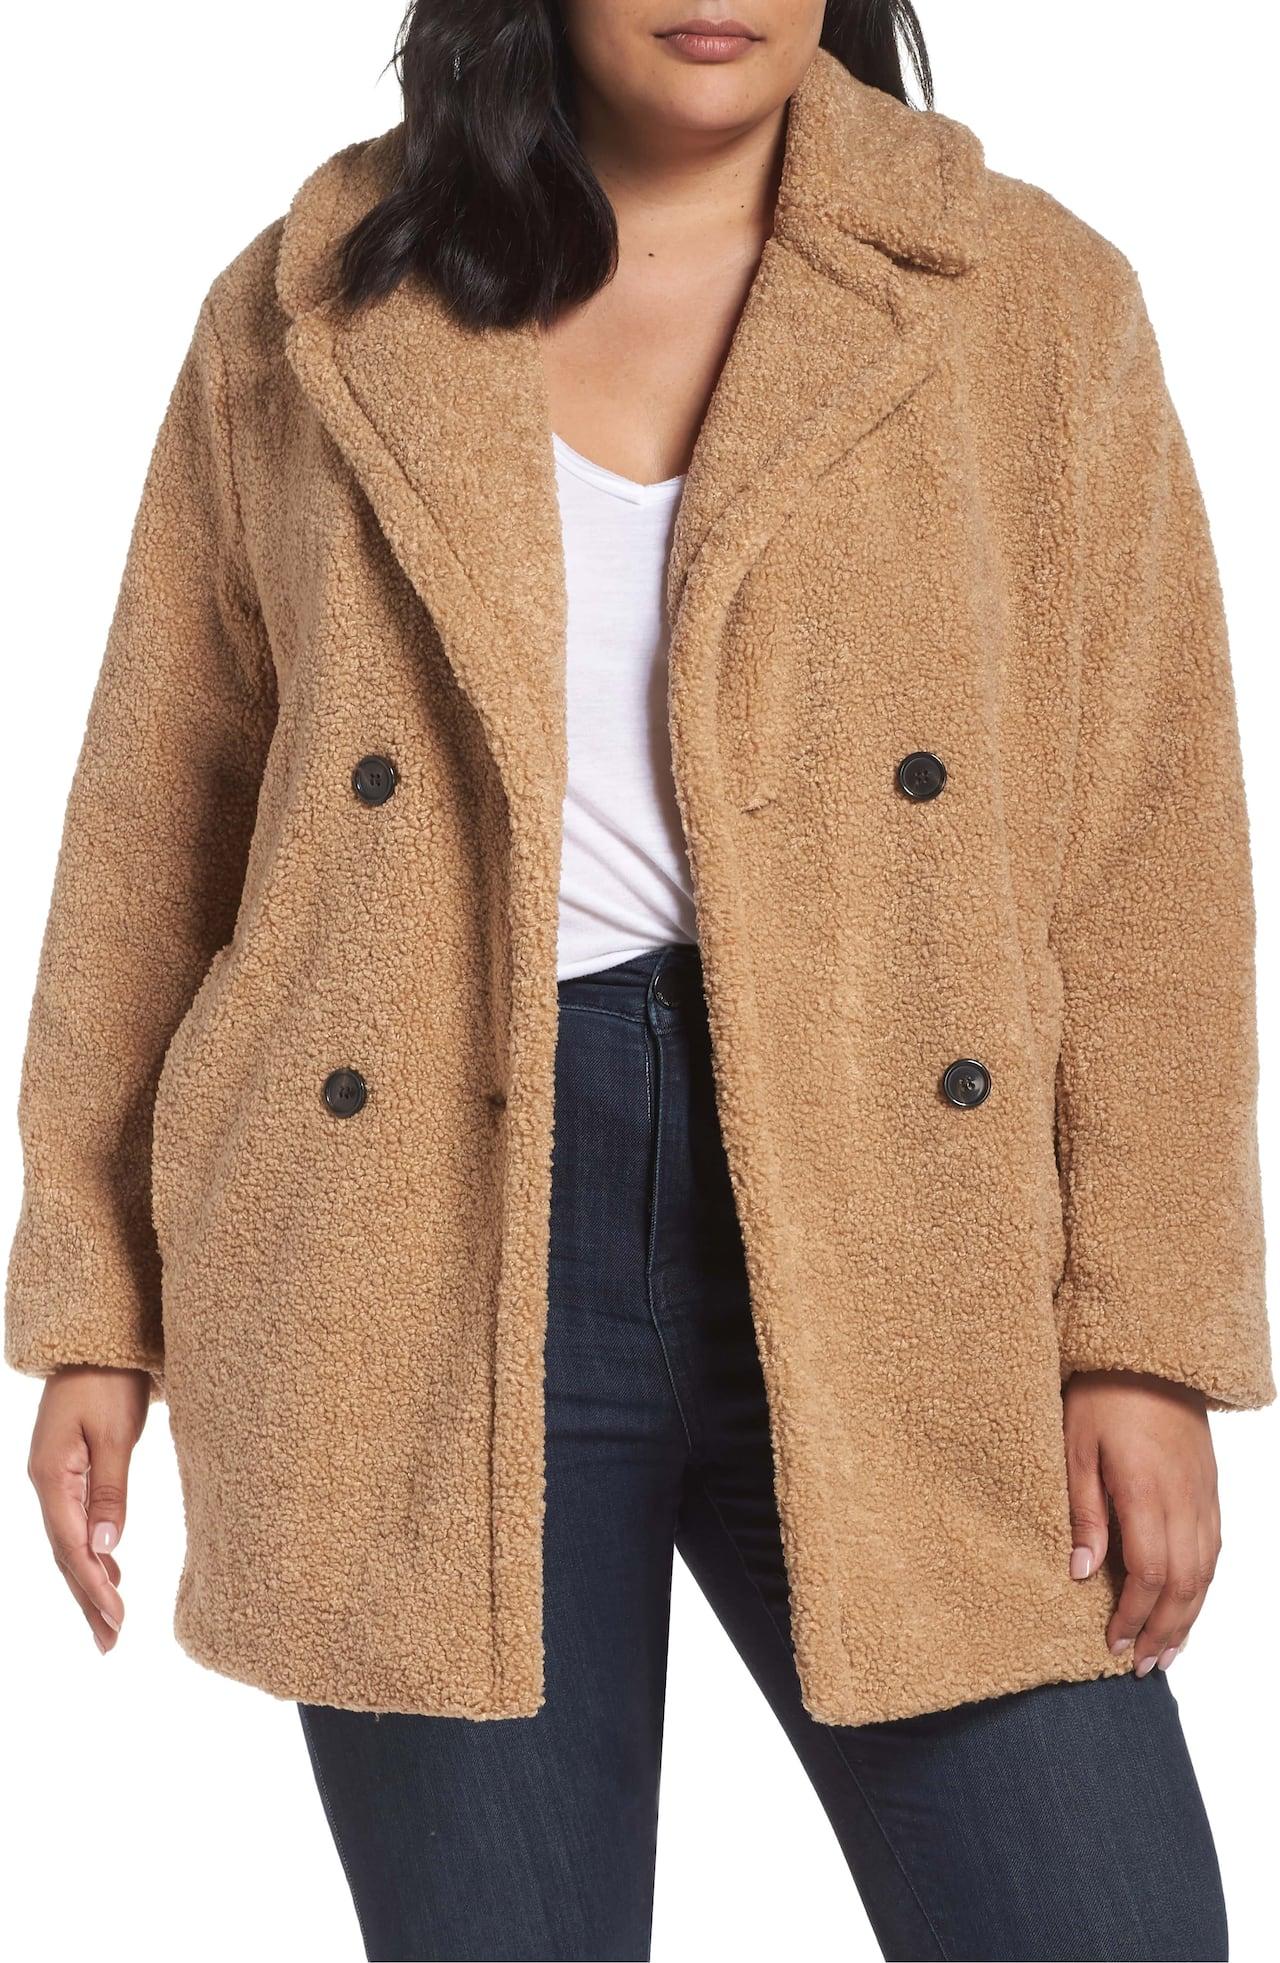 Coat198 Kensie Collar Teddy Faux Fur Notch Bear 0X8knwOP